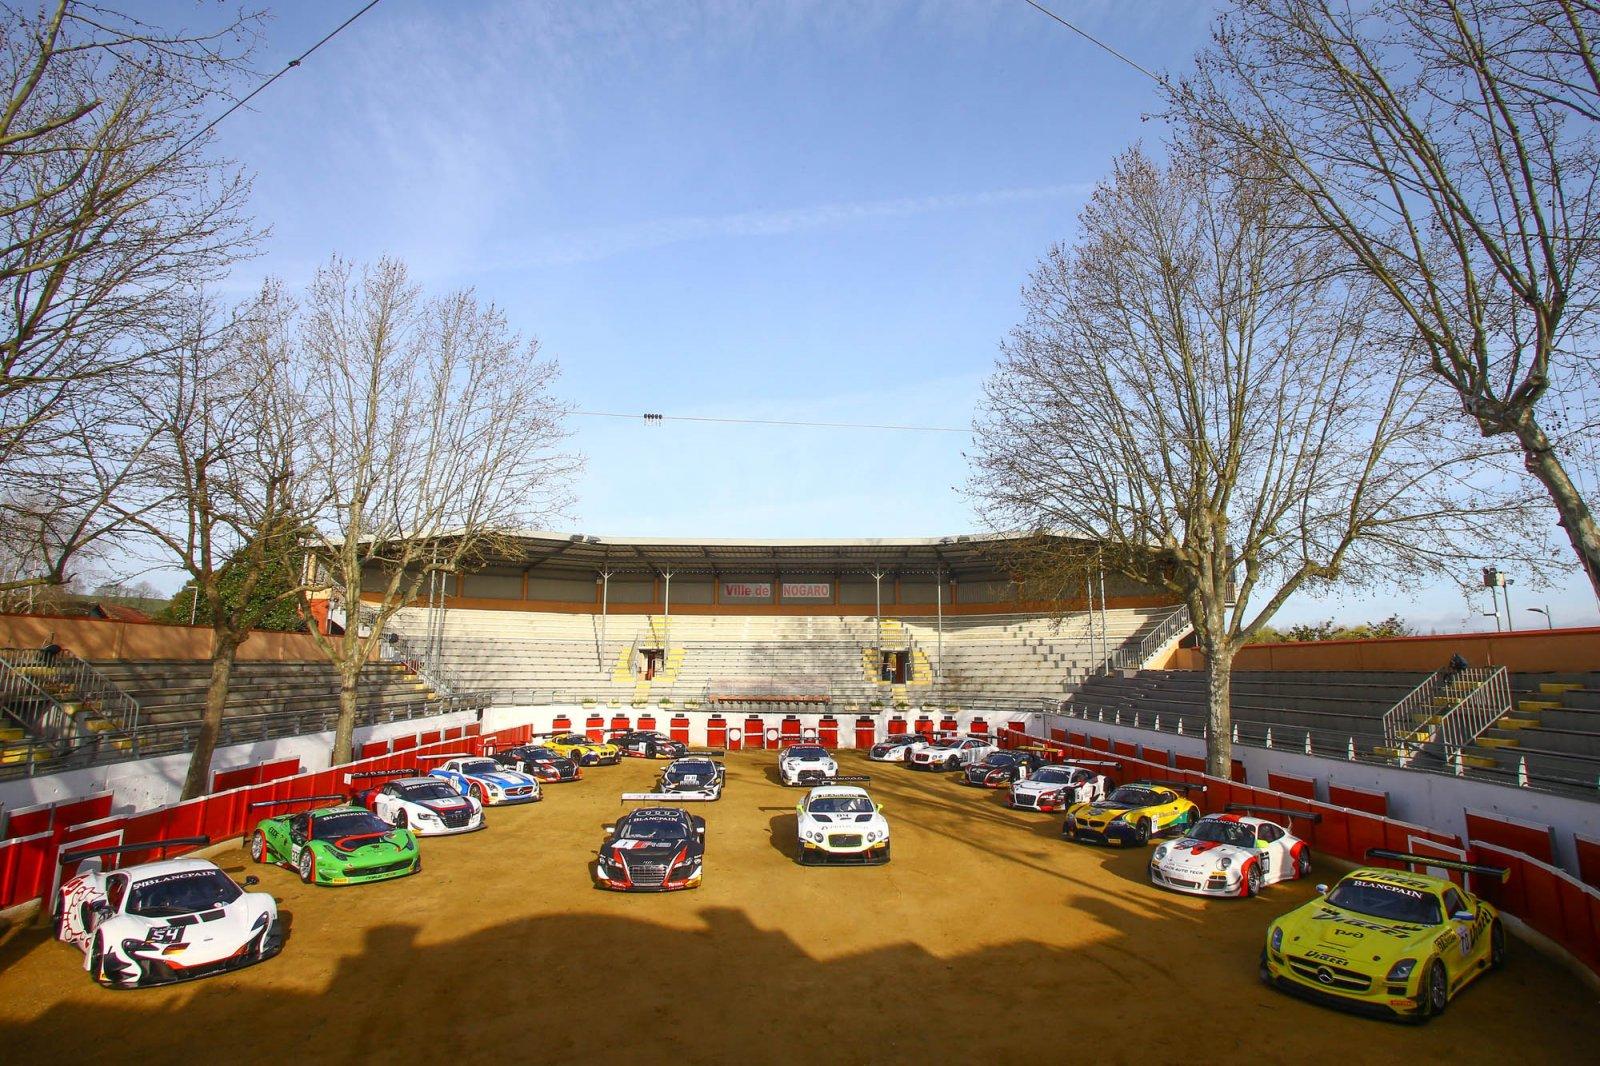 Official photoshoot kicks off Blancpain Sprint Series